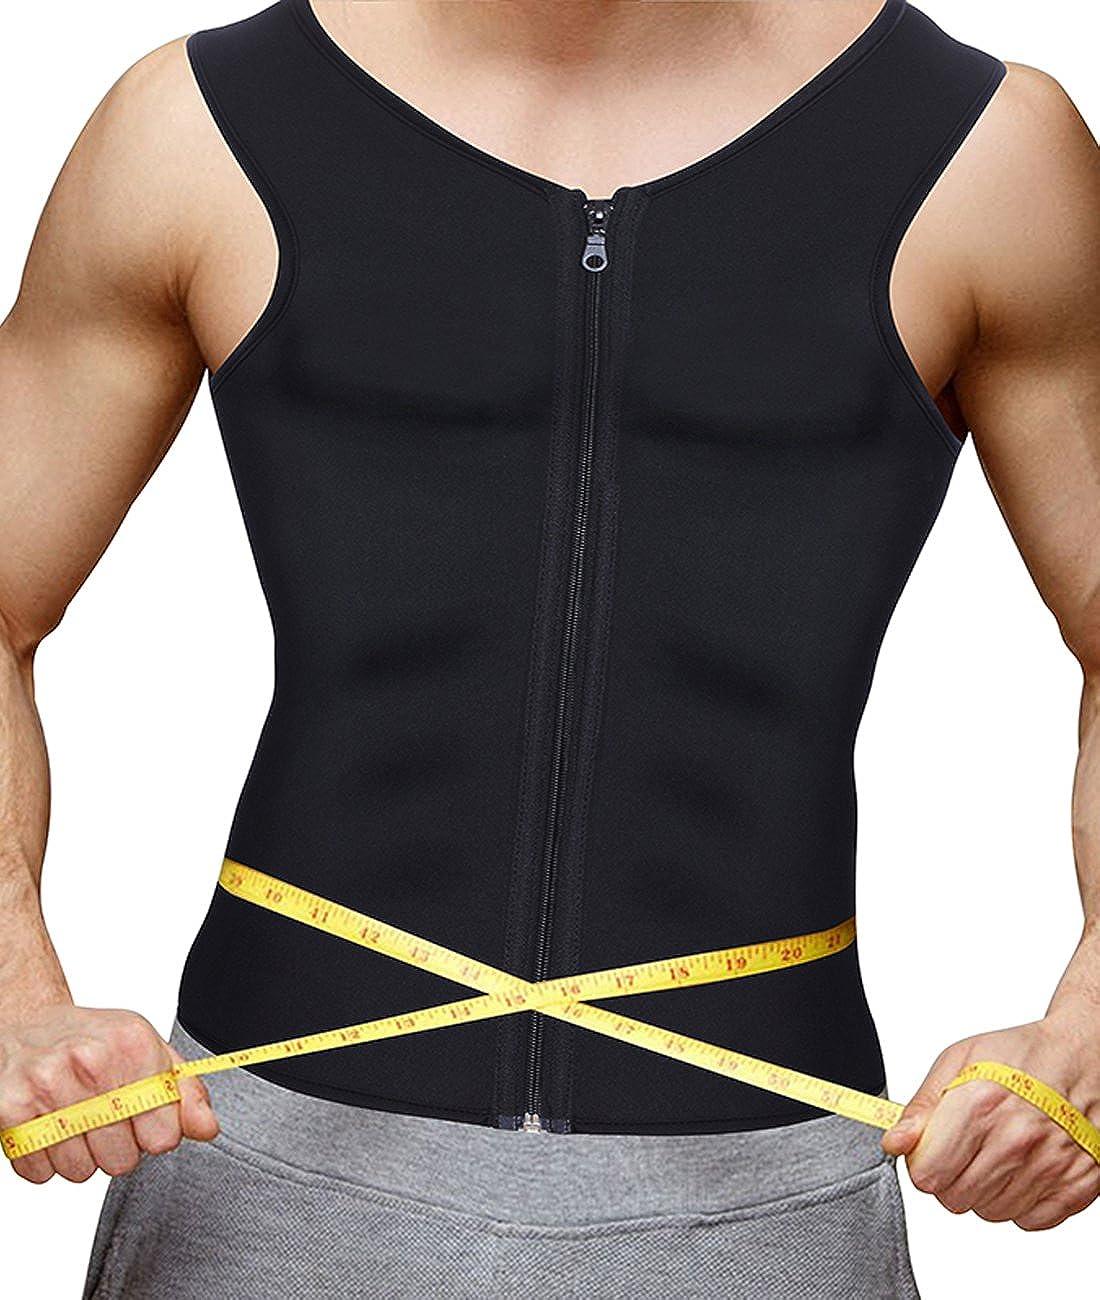 Junlan Mens Sauna Vest Suit Neoprene Sweat Like Crazy Slimming Shirt for Weight Loss Burn More Fat Workout